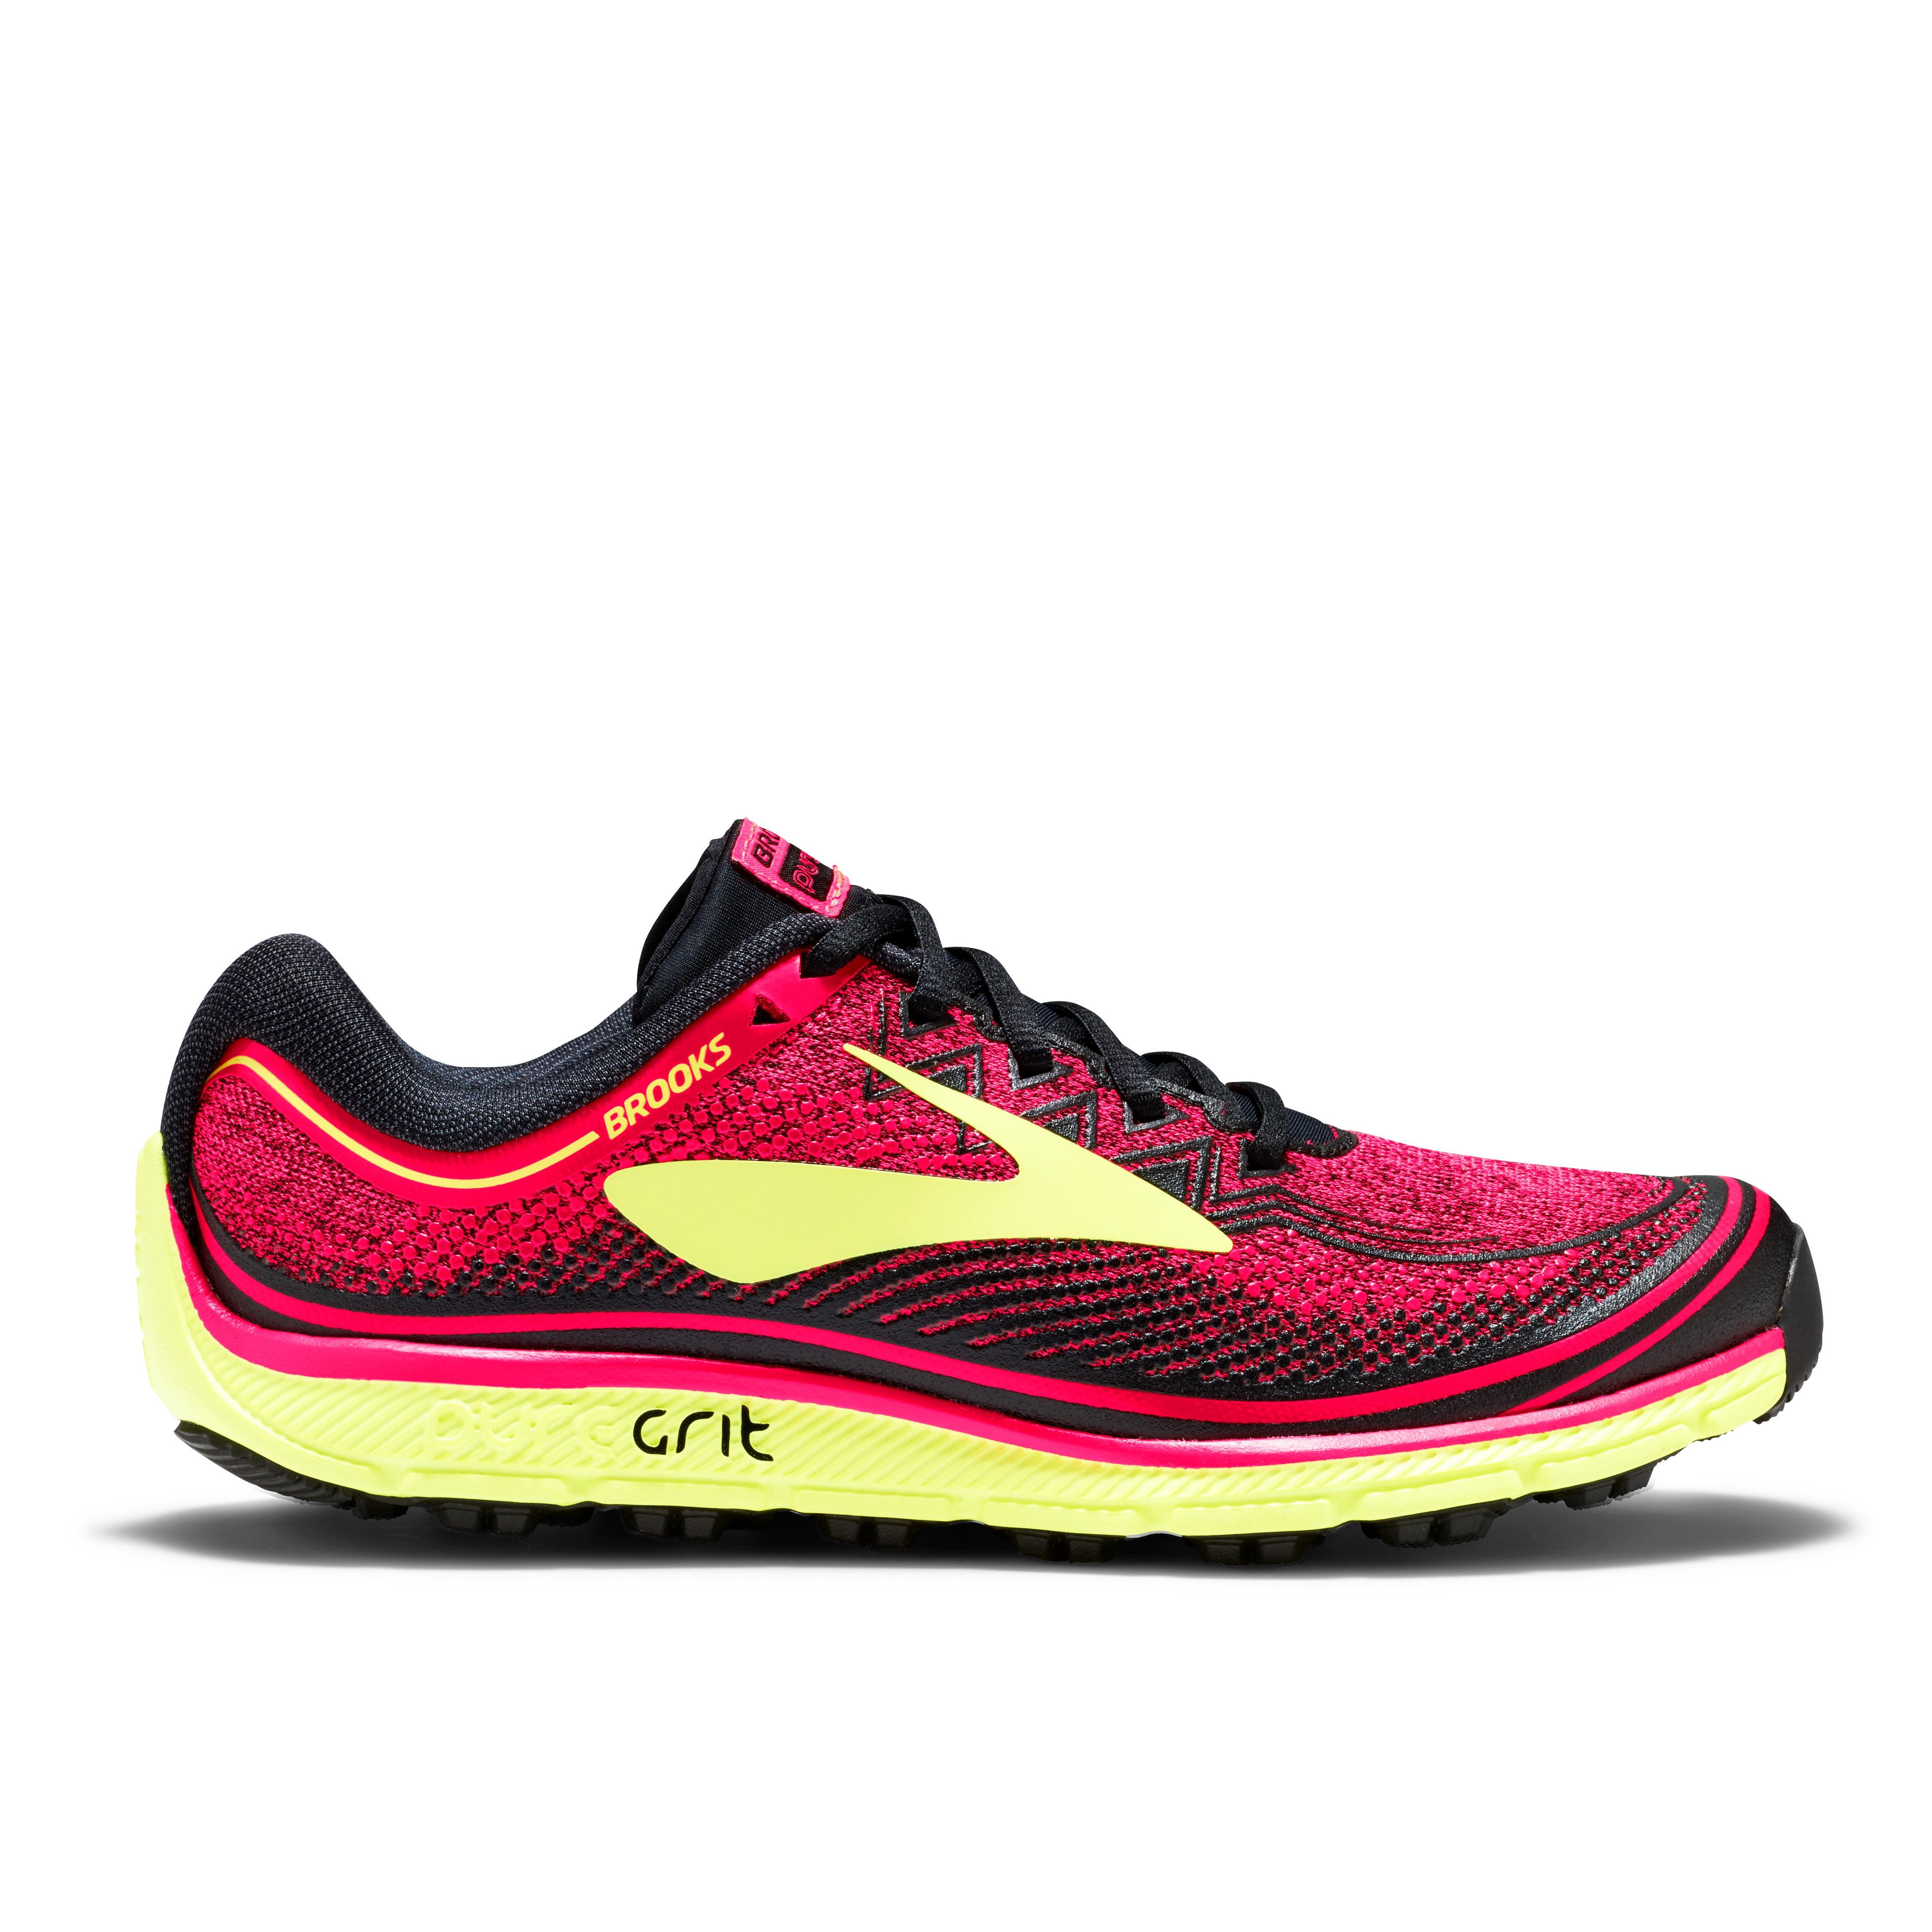 PUREGRIT 6 - Brooks Running Shoes